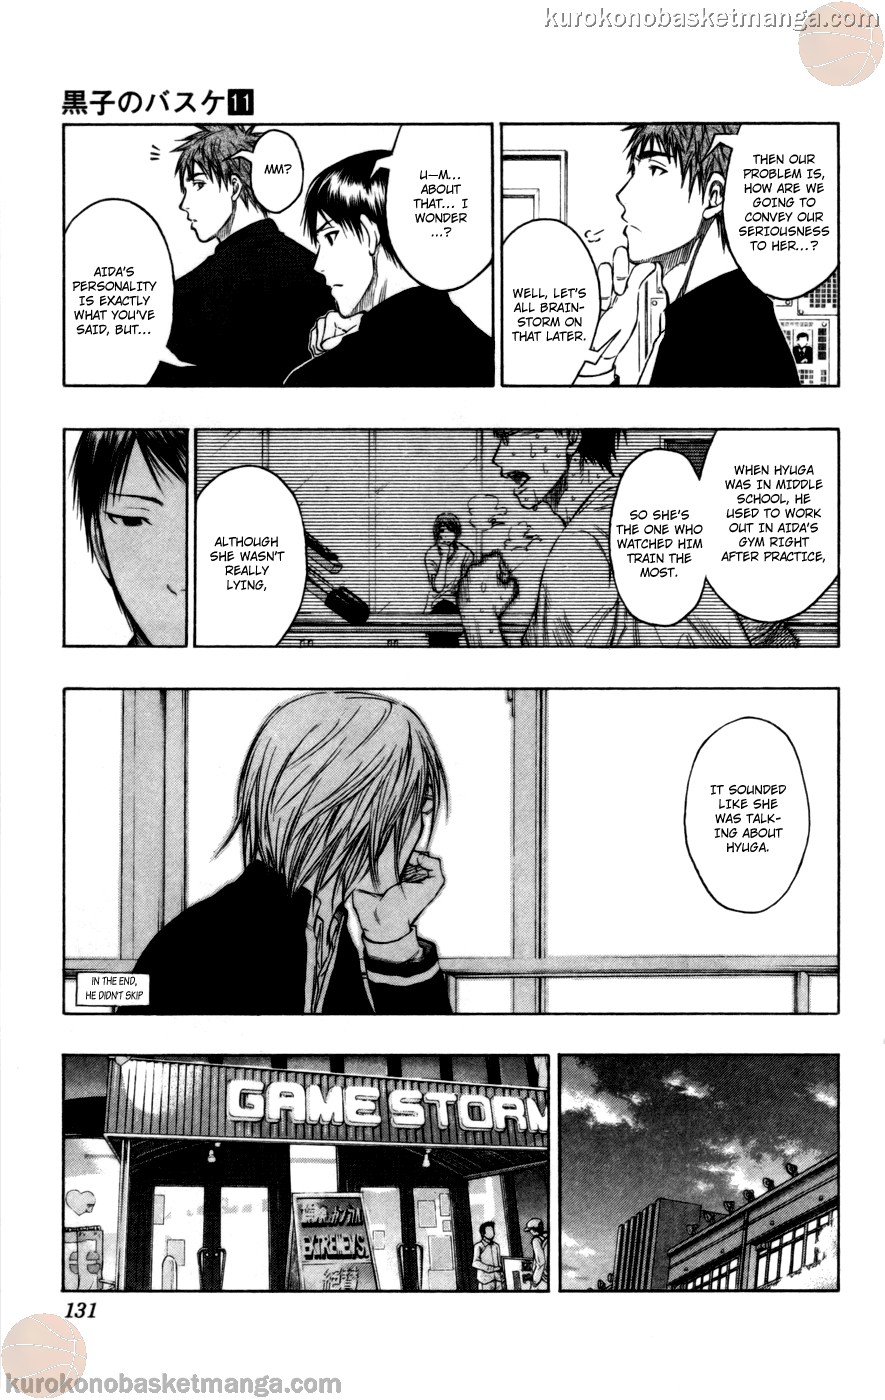 Kuroko no Basket Manga Chapter 96 - Image 05